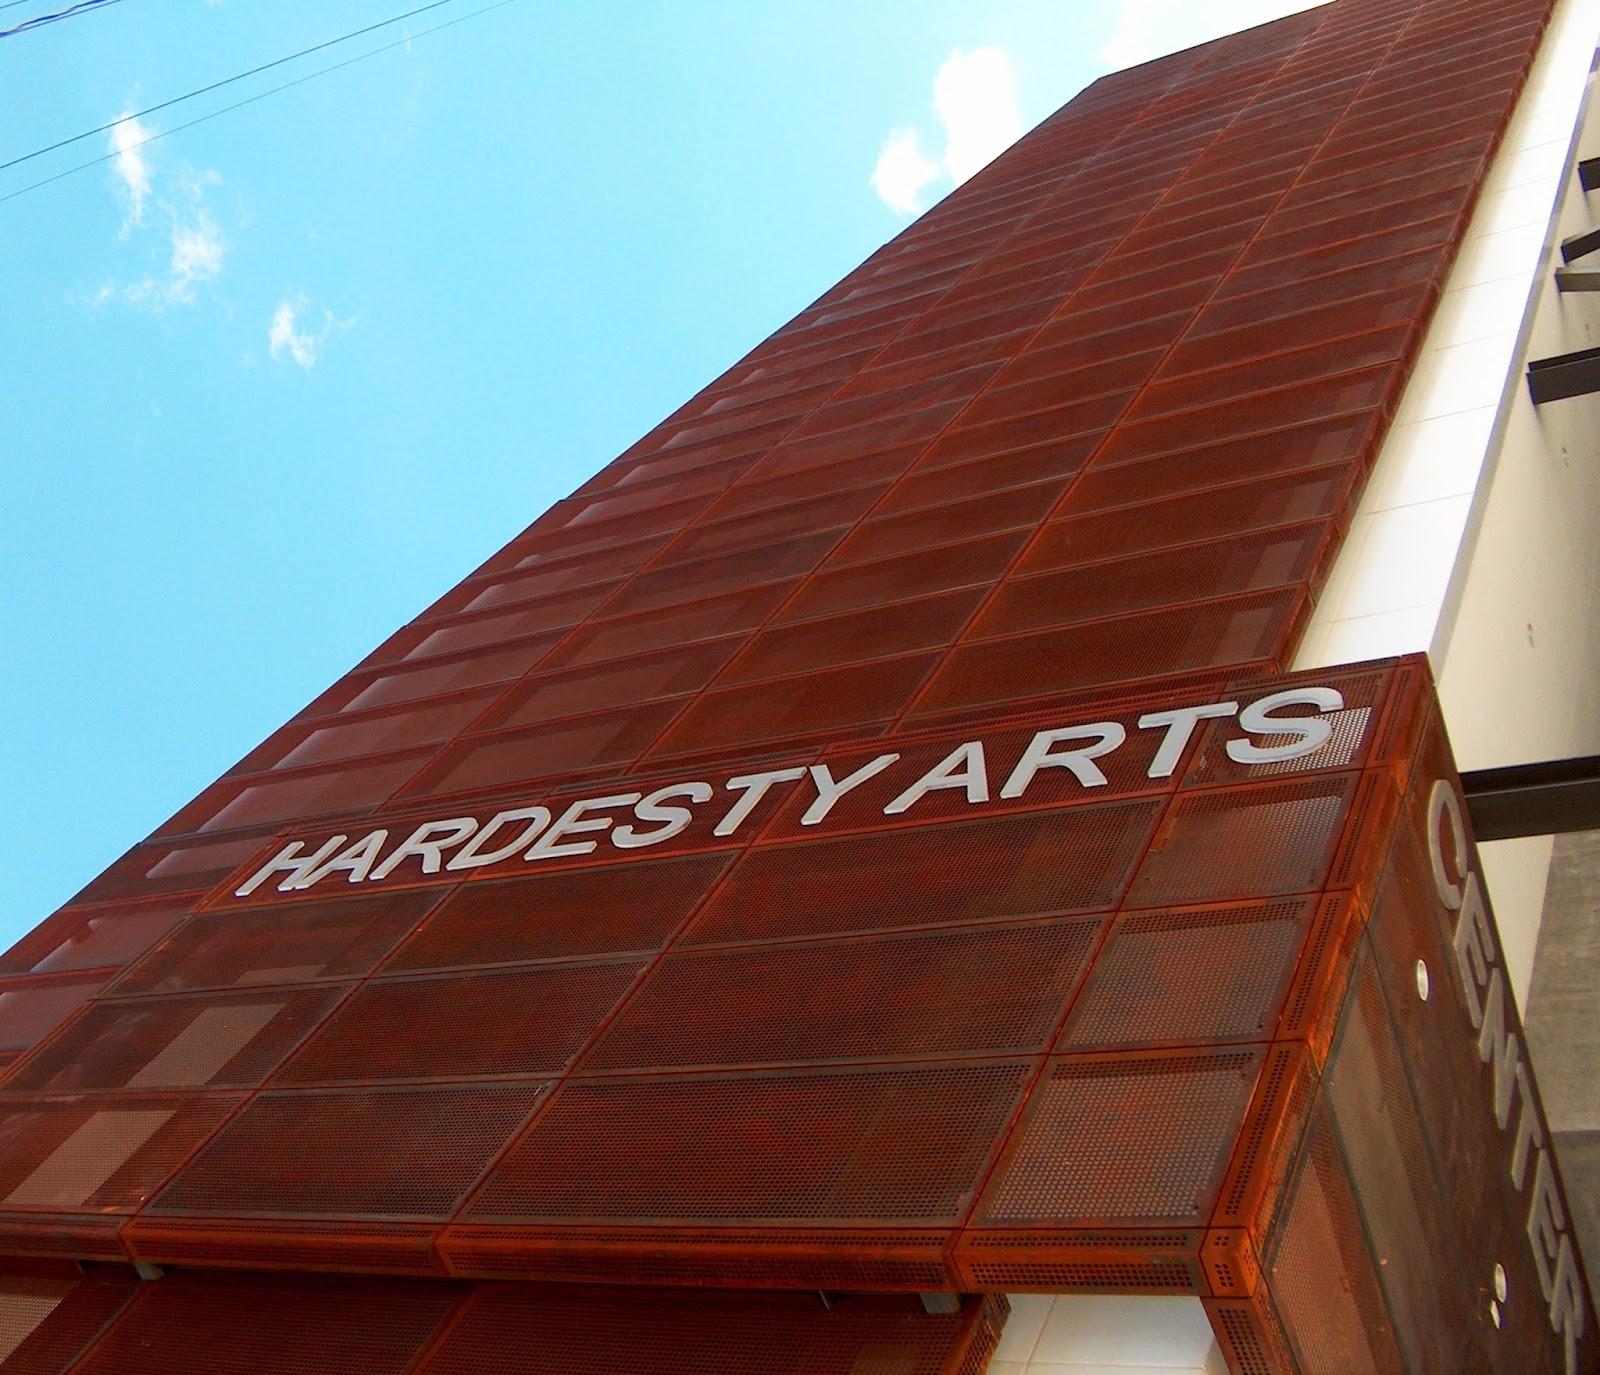 Hardesty Arts Center ~ Arts and Humanities Tulsa